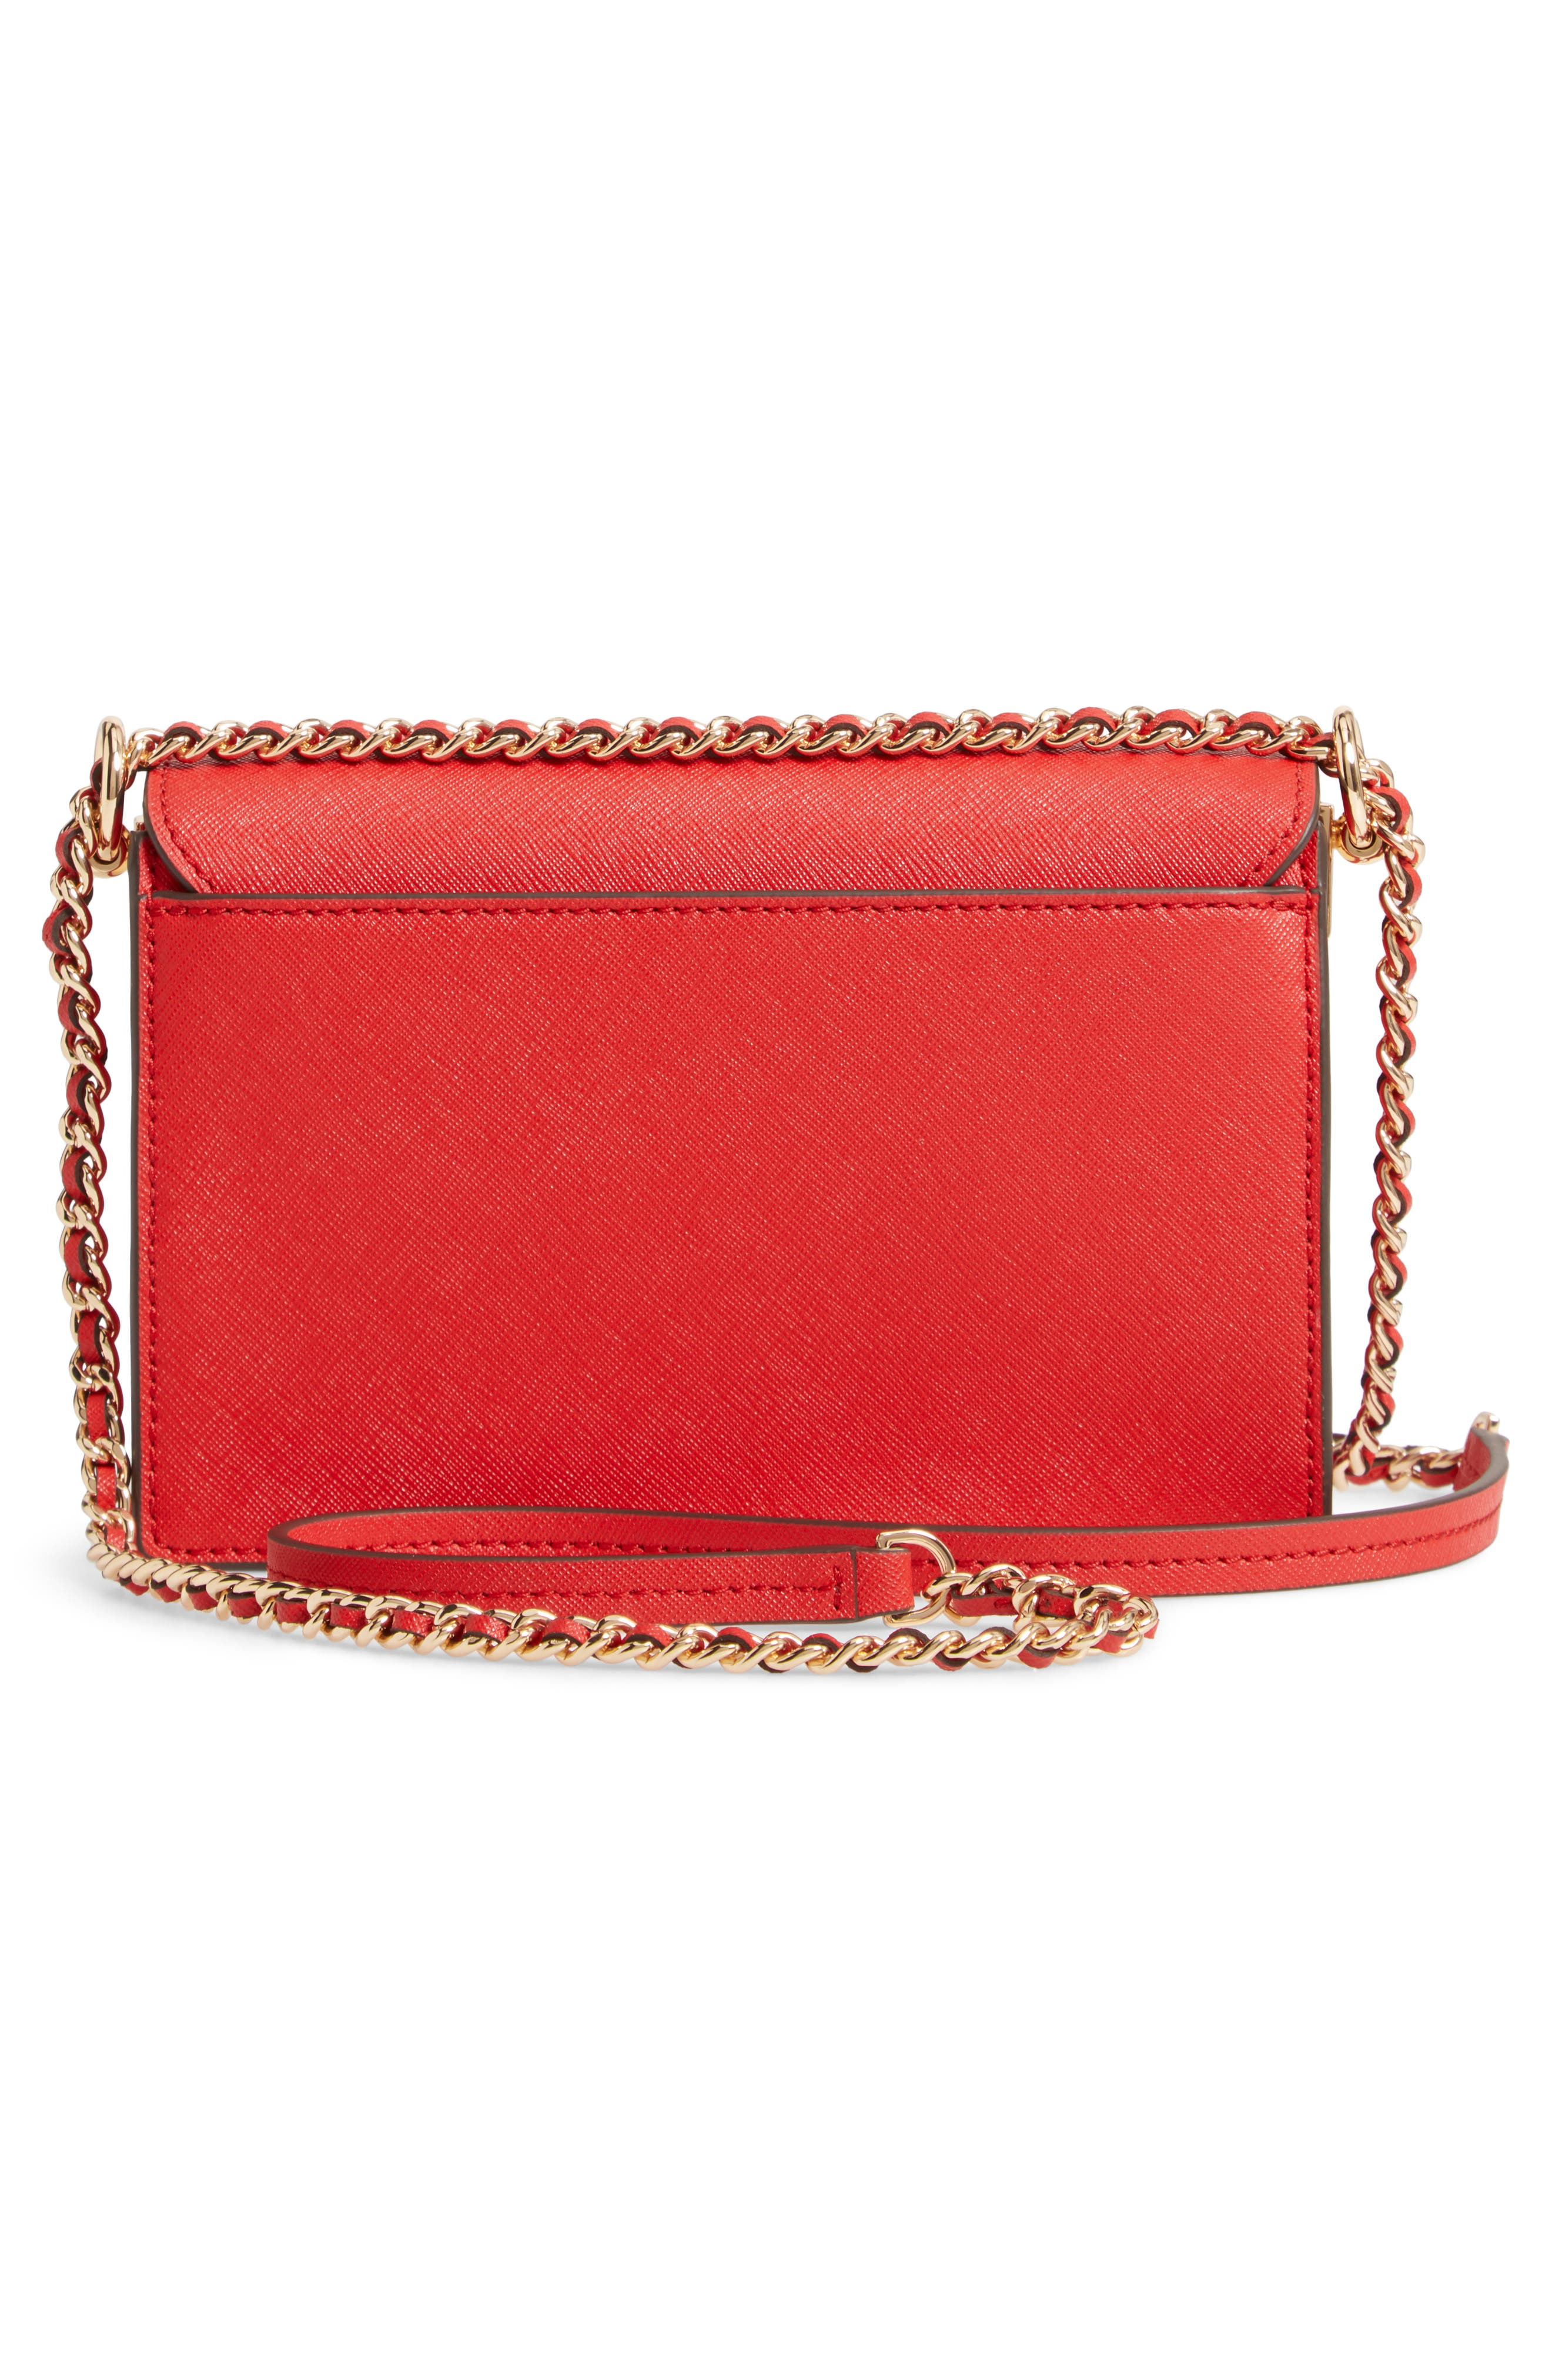 Mini Robinson Convertible Leather Shoulder Bag,                             Alternate thumbnail 3, color,                             BRILLIANT RED